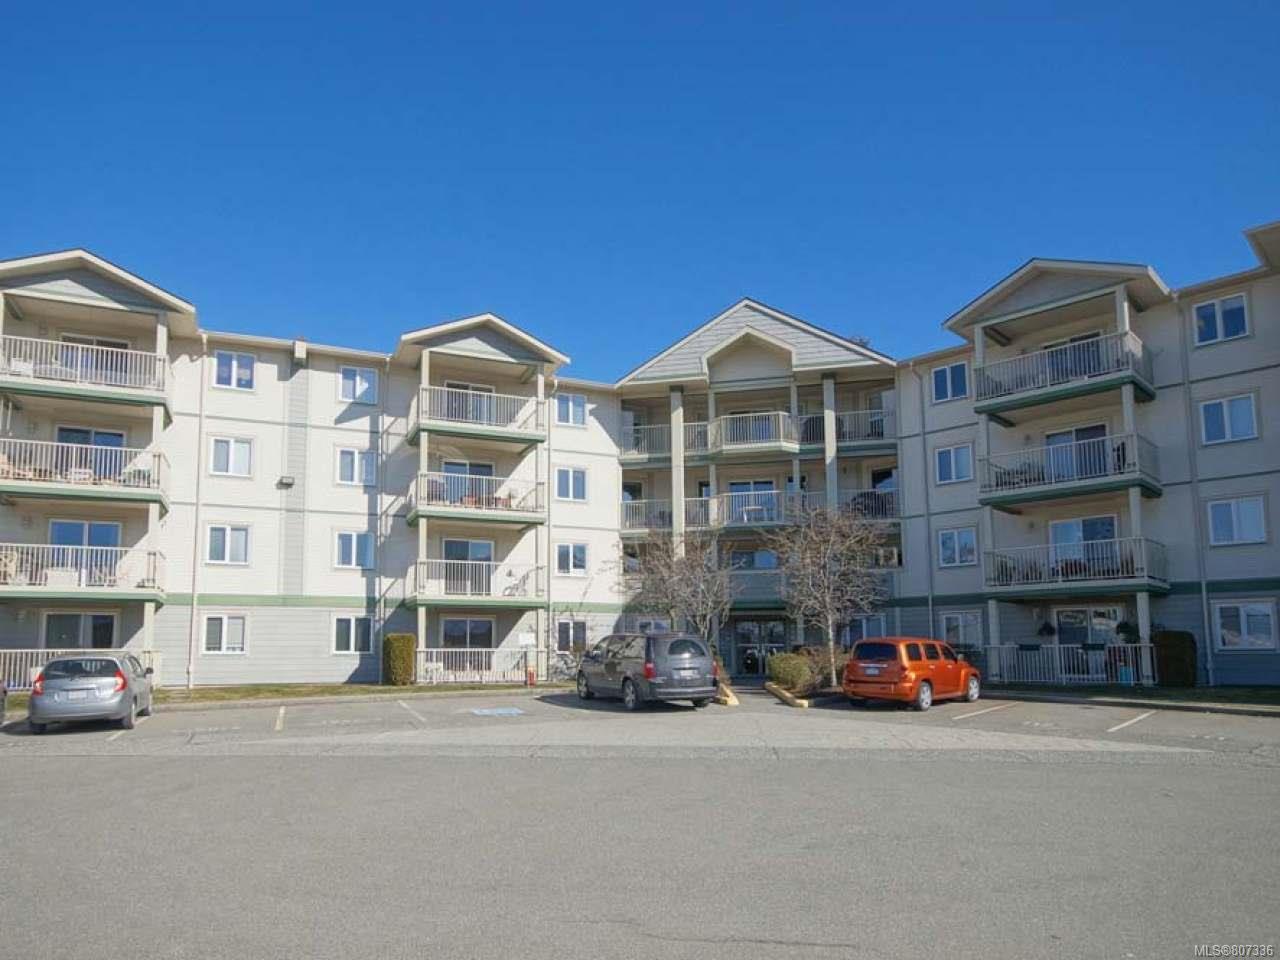 Main Photo: 115 4971 SONGBIRD PLACE in NANAIMO: Na Uplands Condo for sale (Nanaimo)  : MLS®# 807336